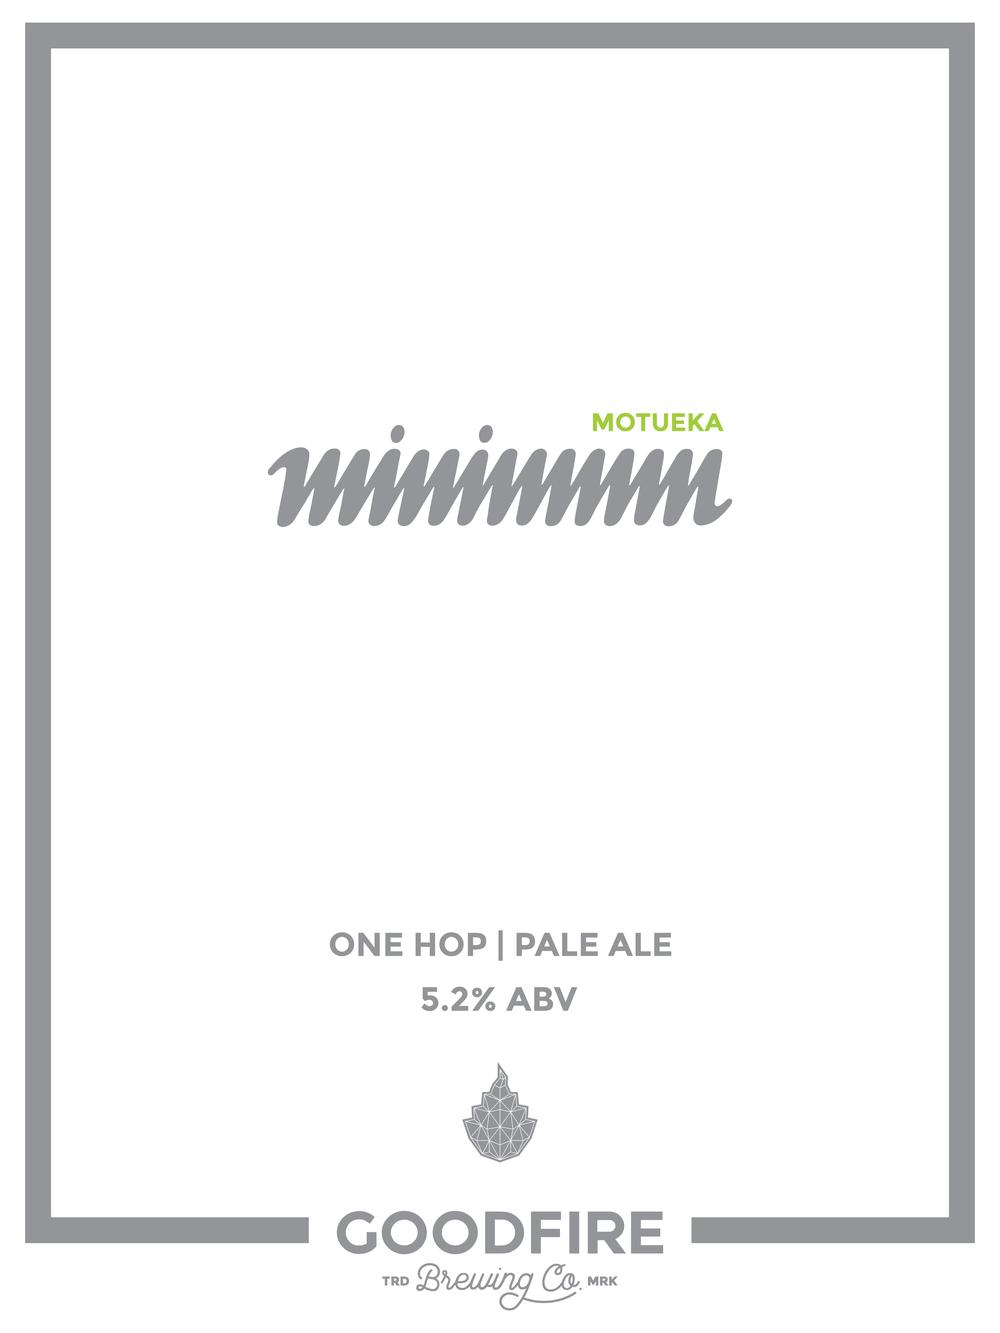 Goodfire Minimum - Motueka Poster-01.png